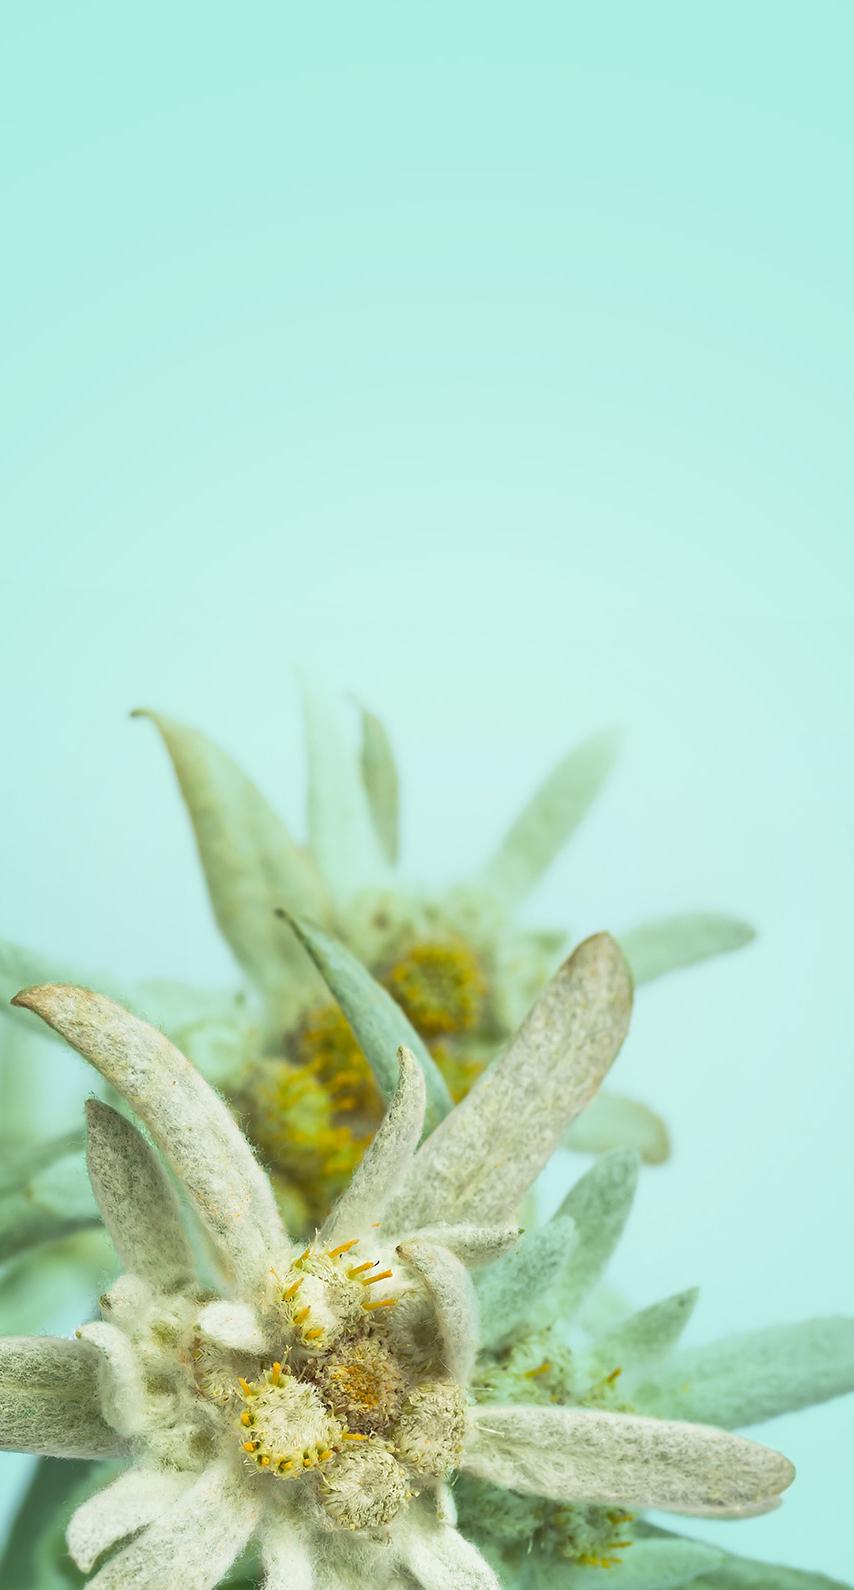 plant, plant stem